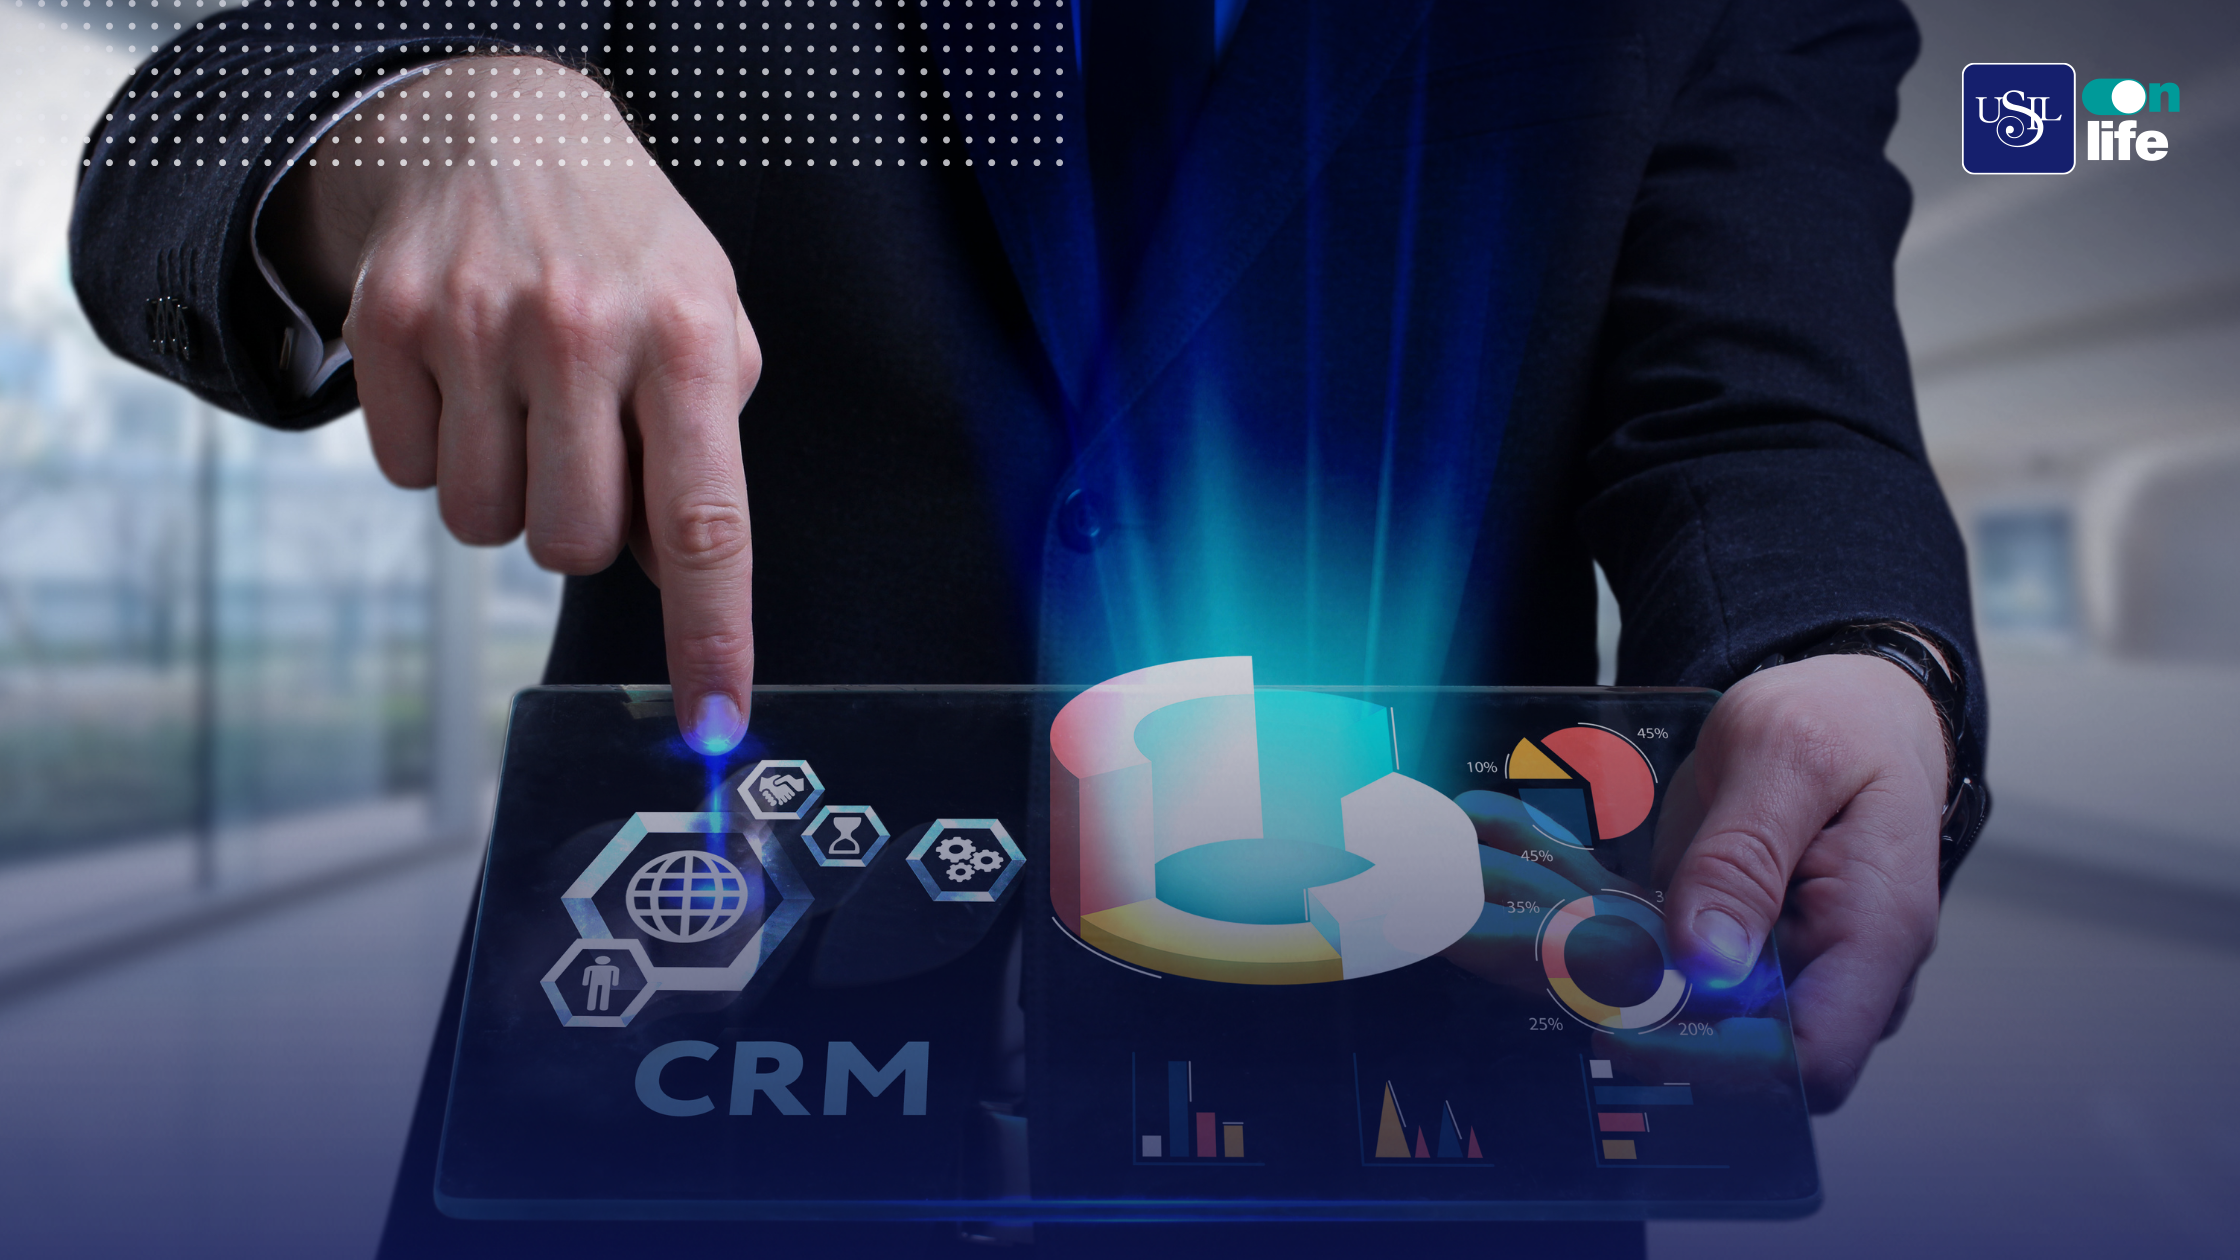 CRM marketing automotion